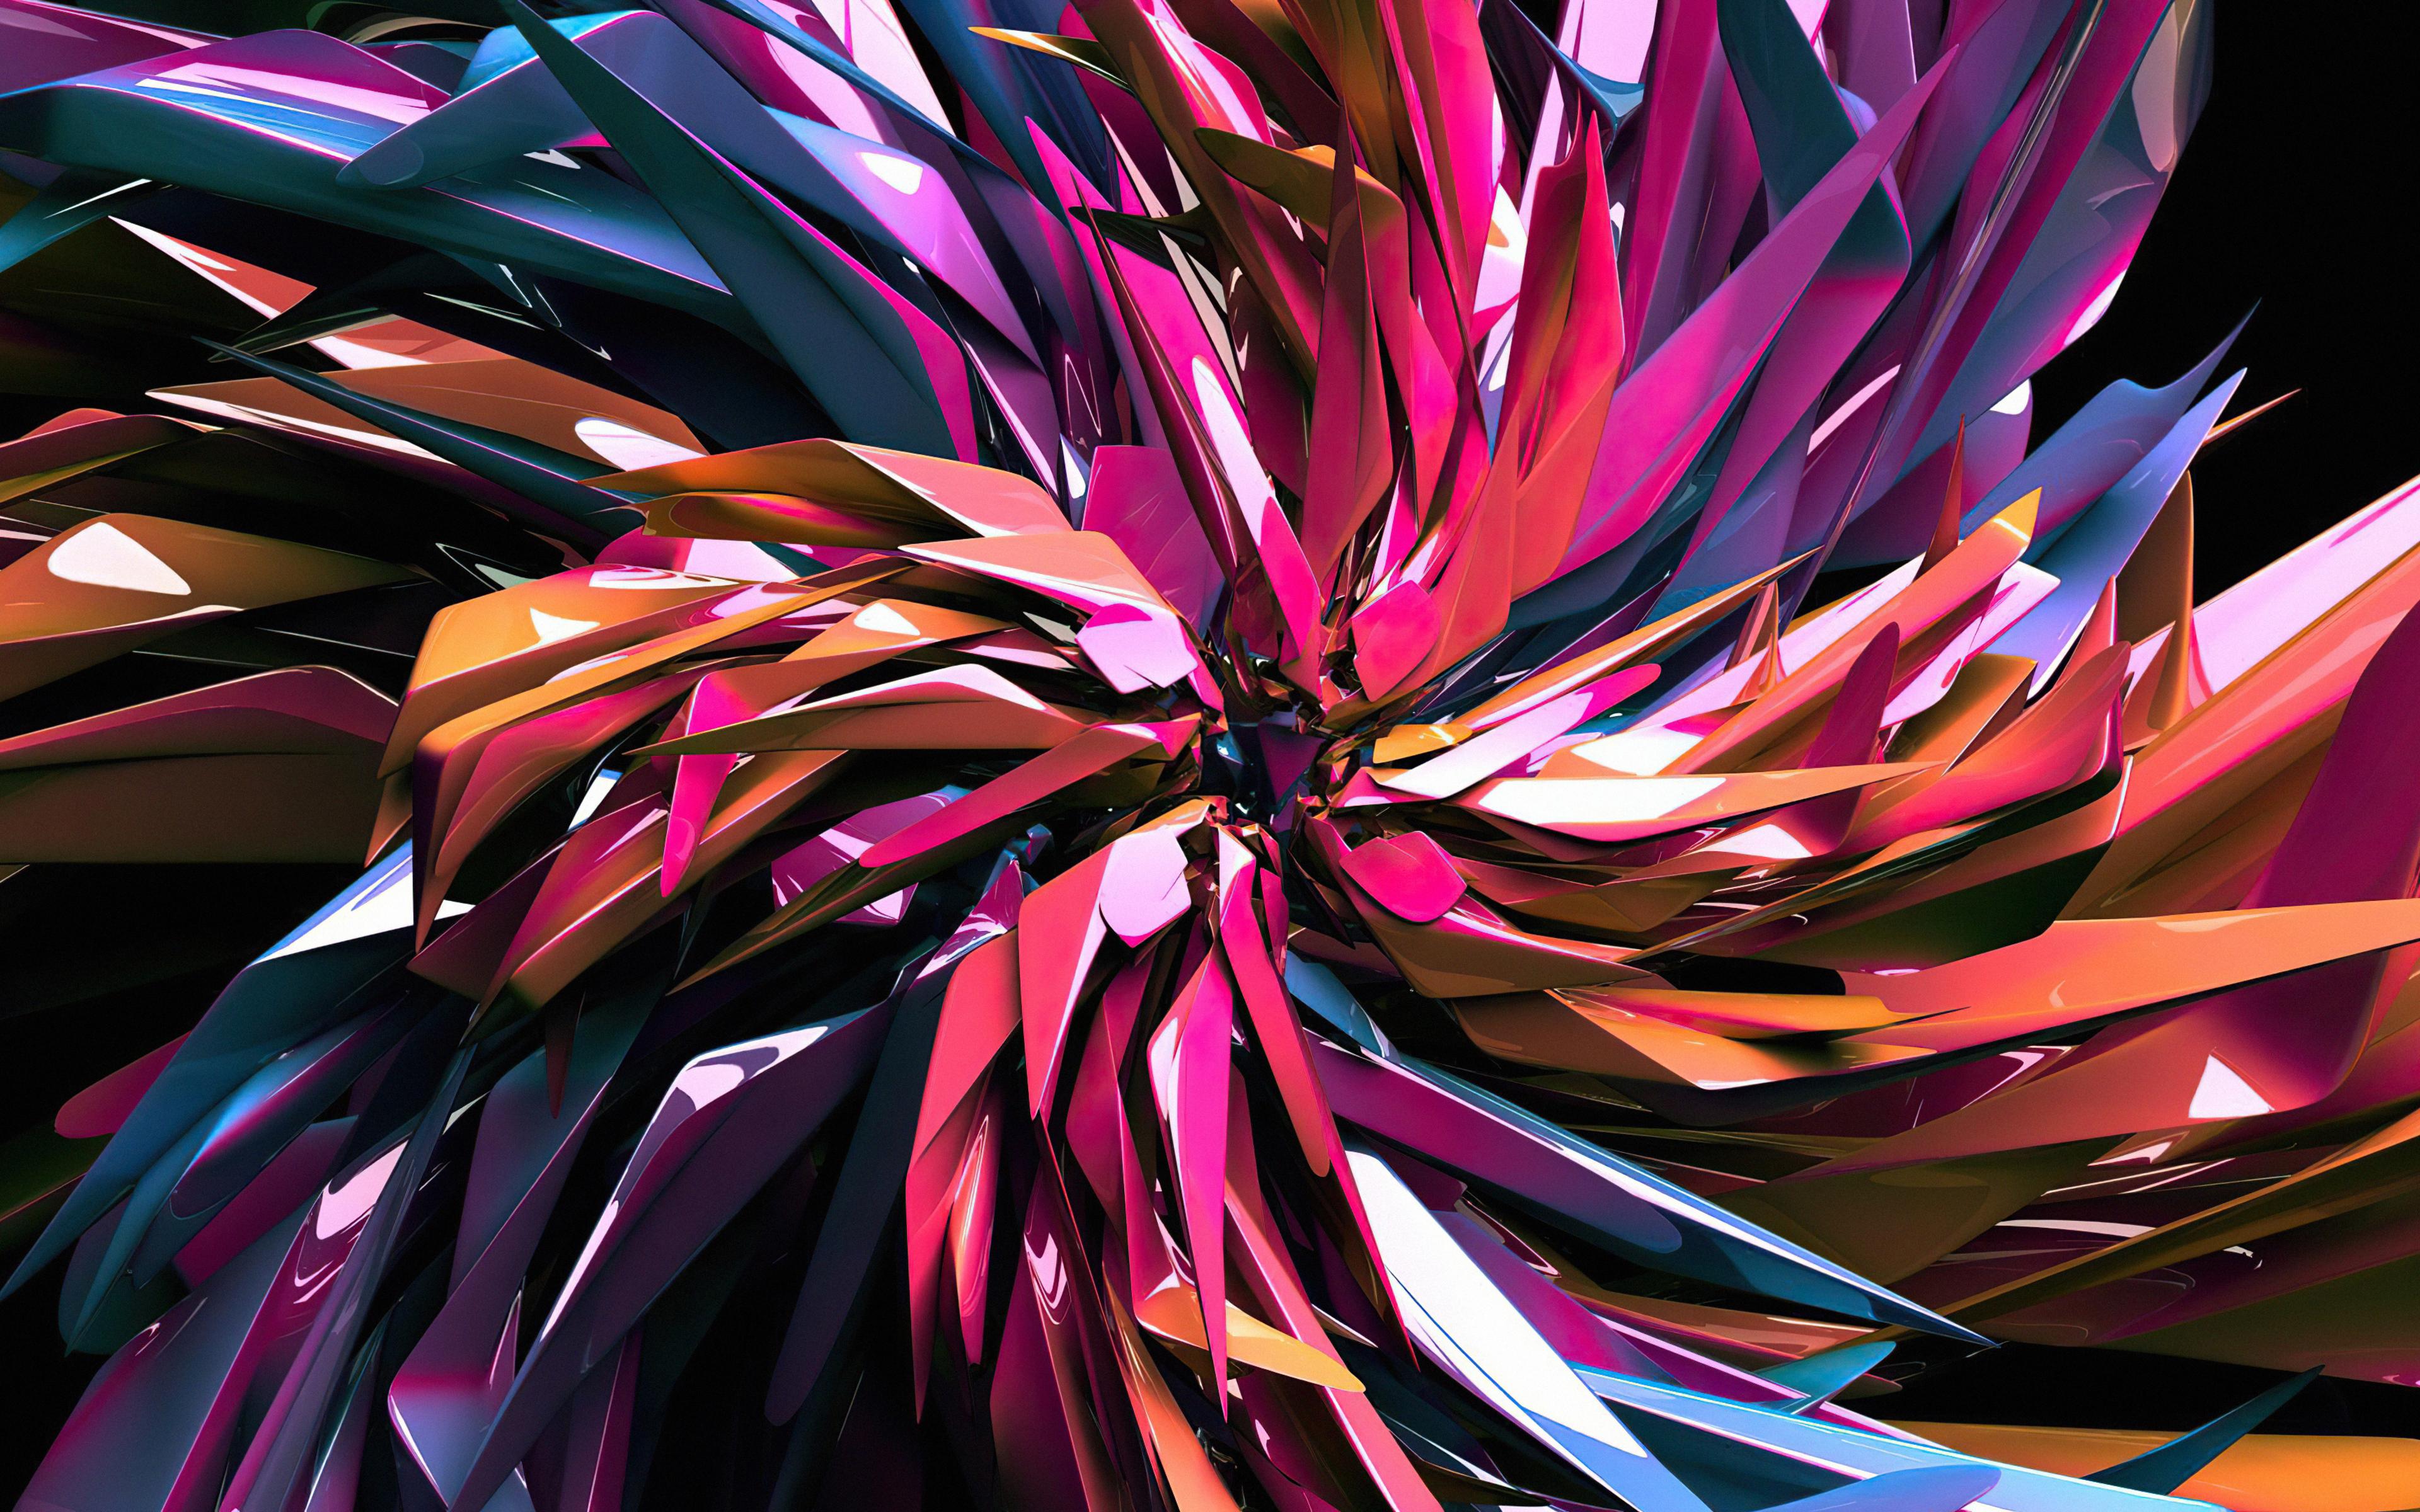 colorful-3d-render-abstract-4k-tk.jpg